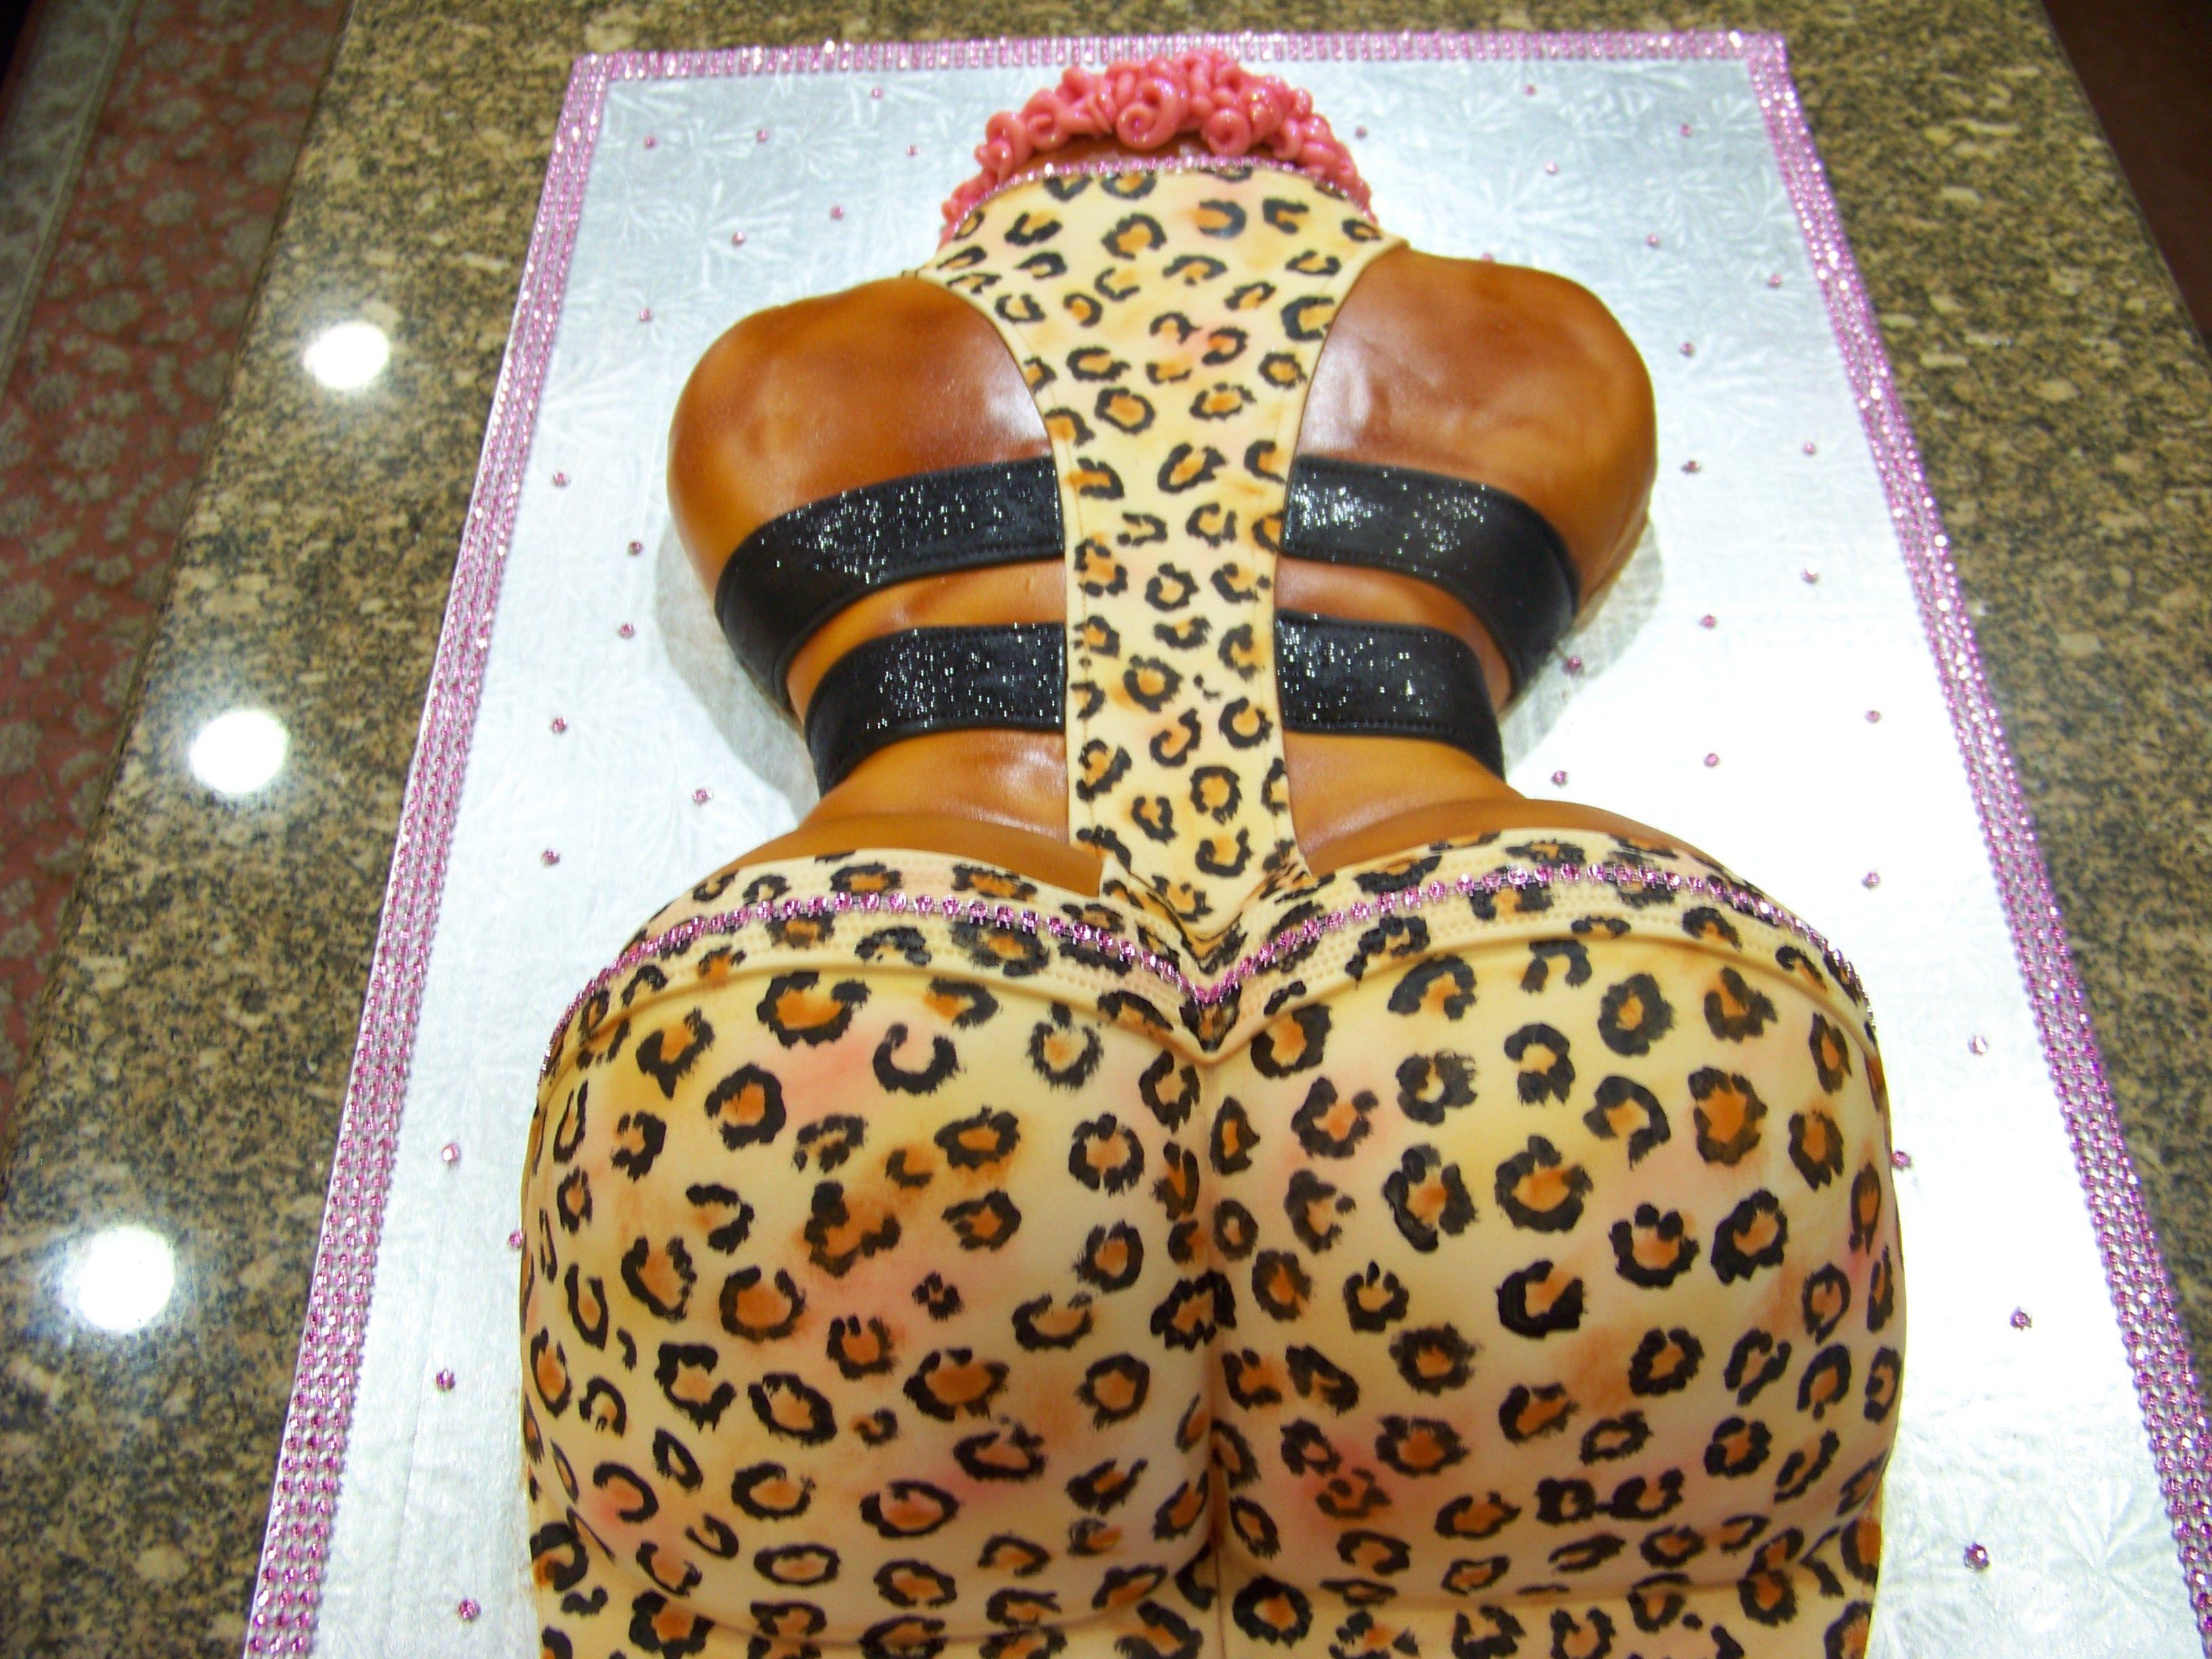 Nicki Minaj Bum Cake